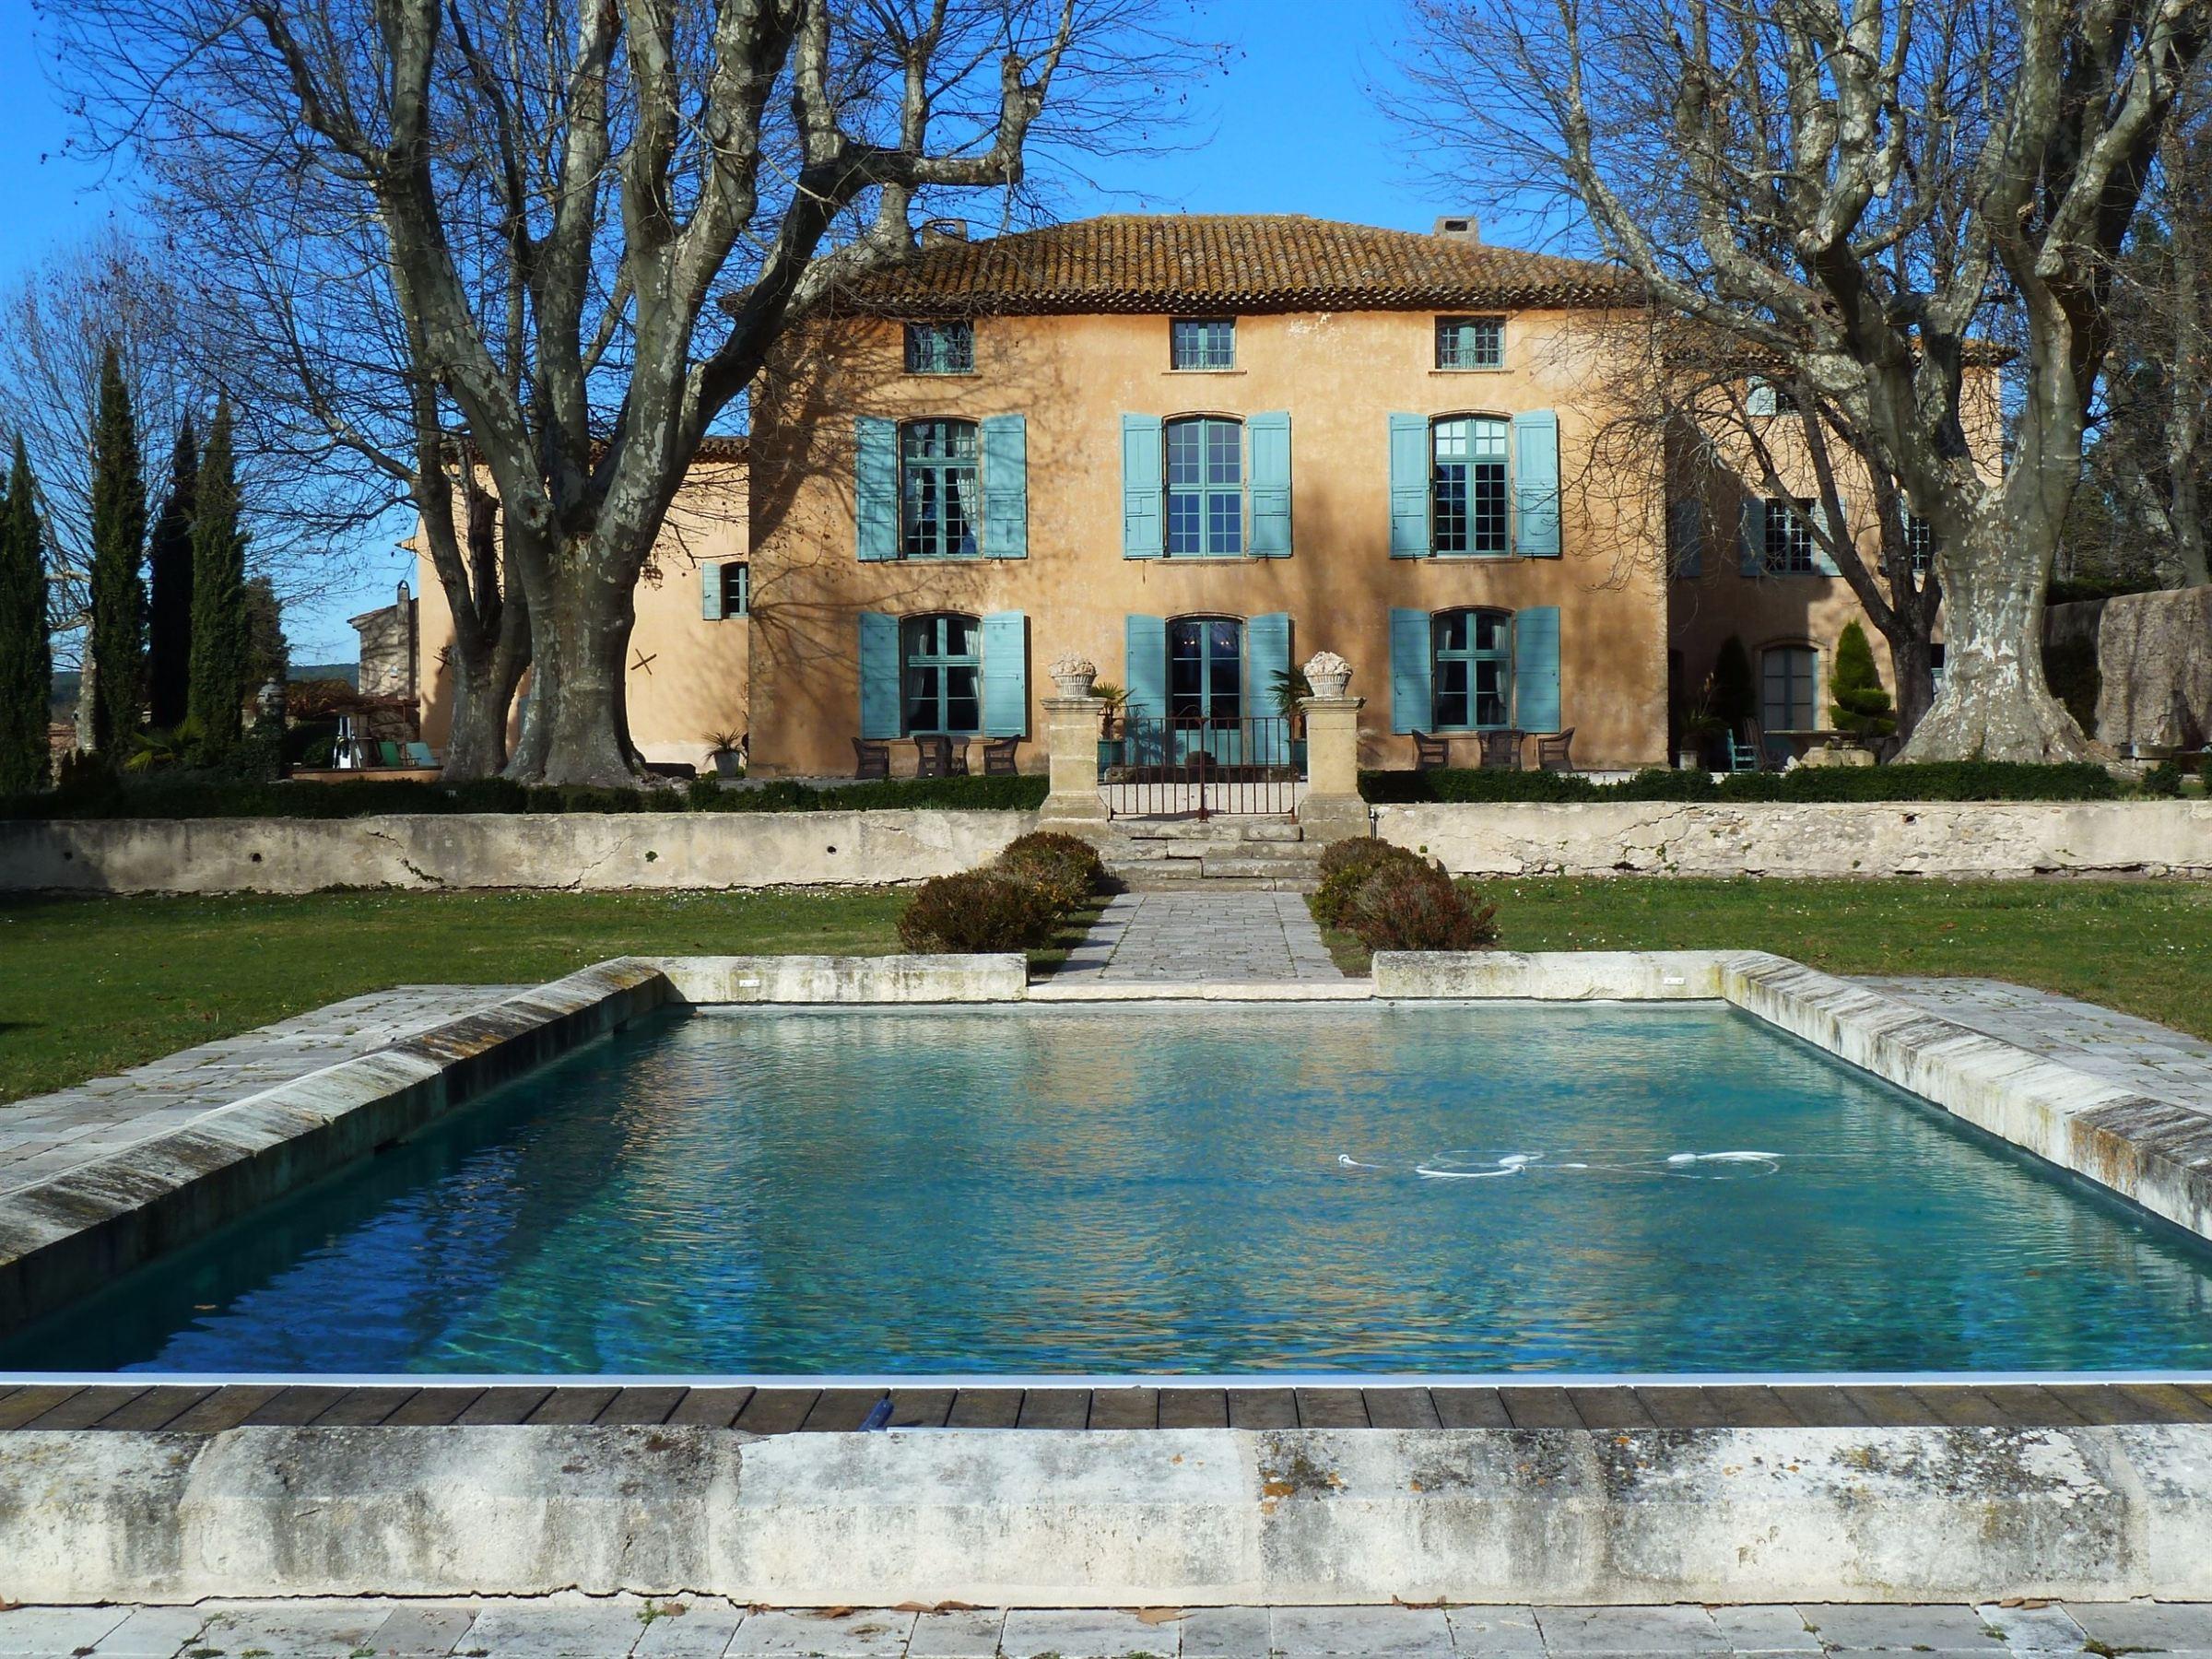 Single Family Home for Sale at AIX LES MILLES - EXCEPTION Other Provence-Alpes-Cote D'Azur, Provence-Alpes-Cote D'Azur, 13100 France